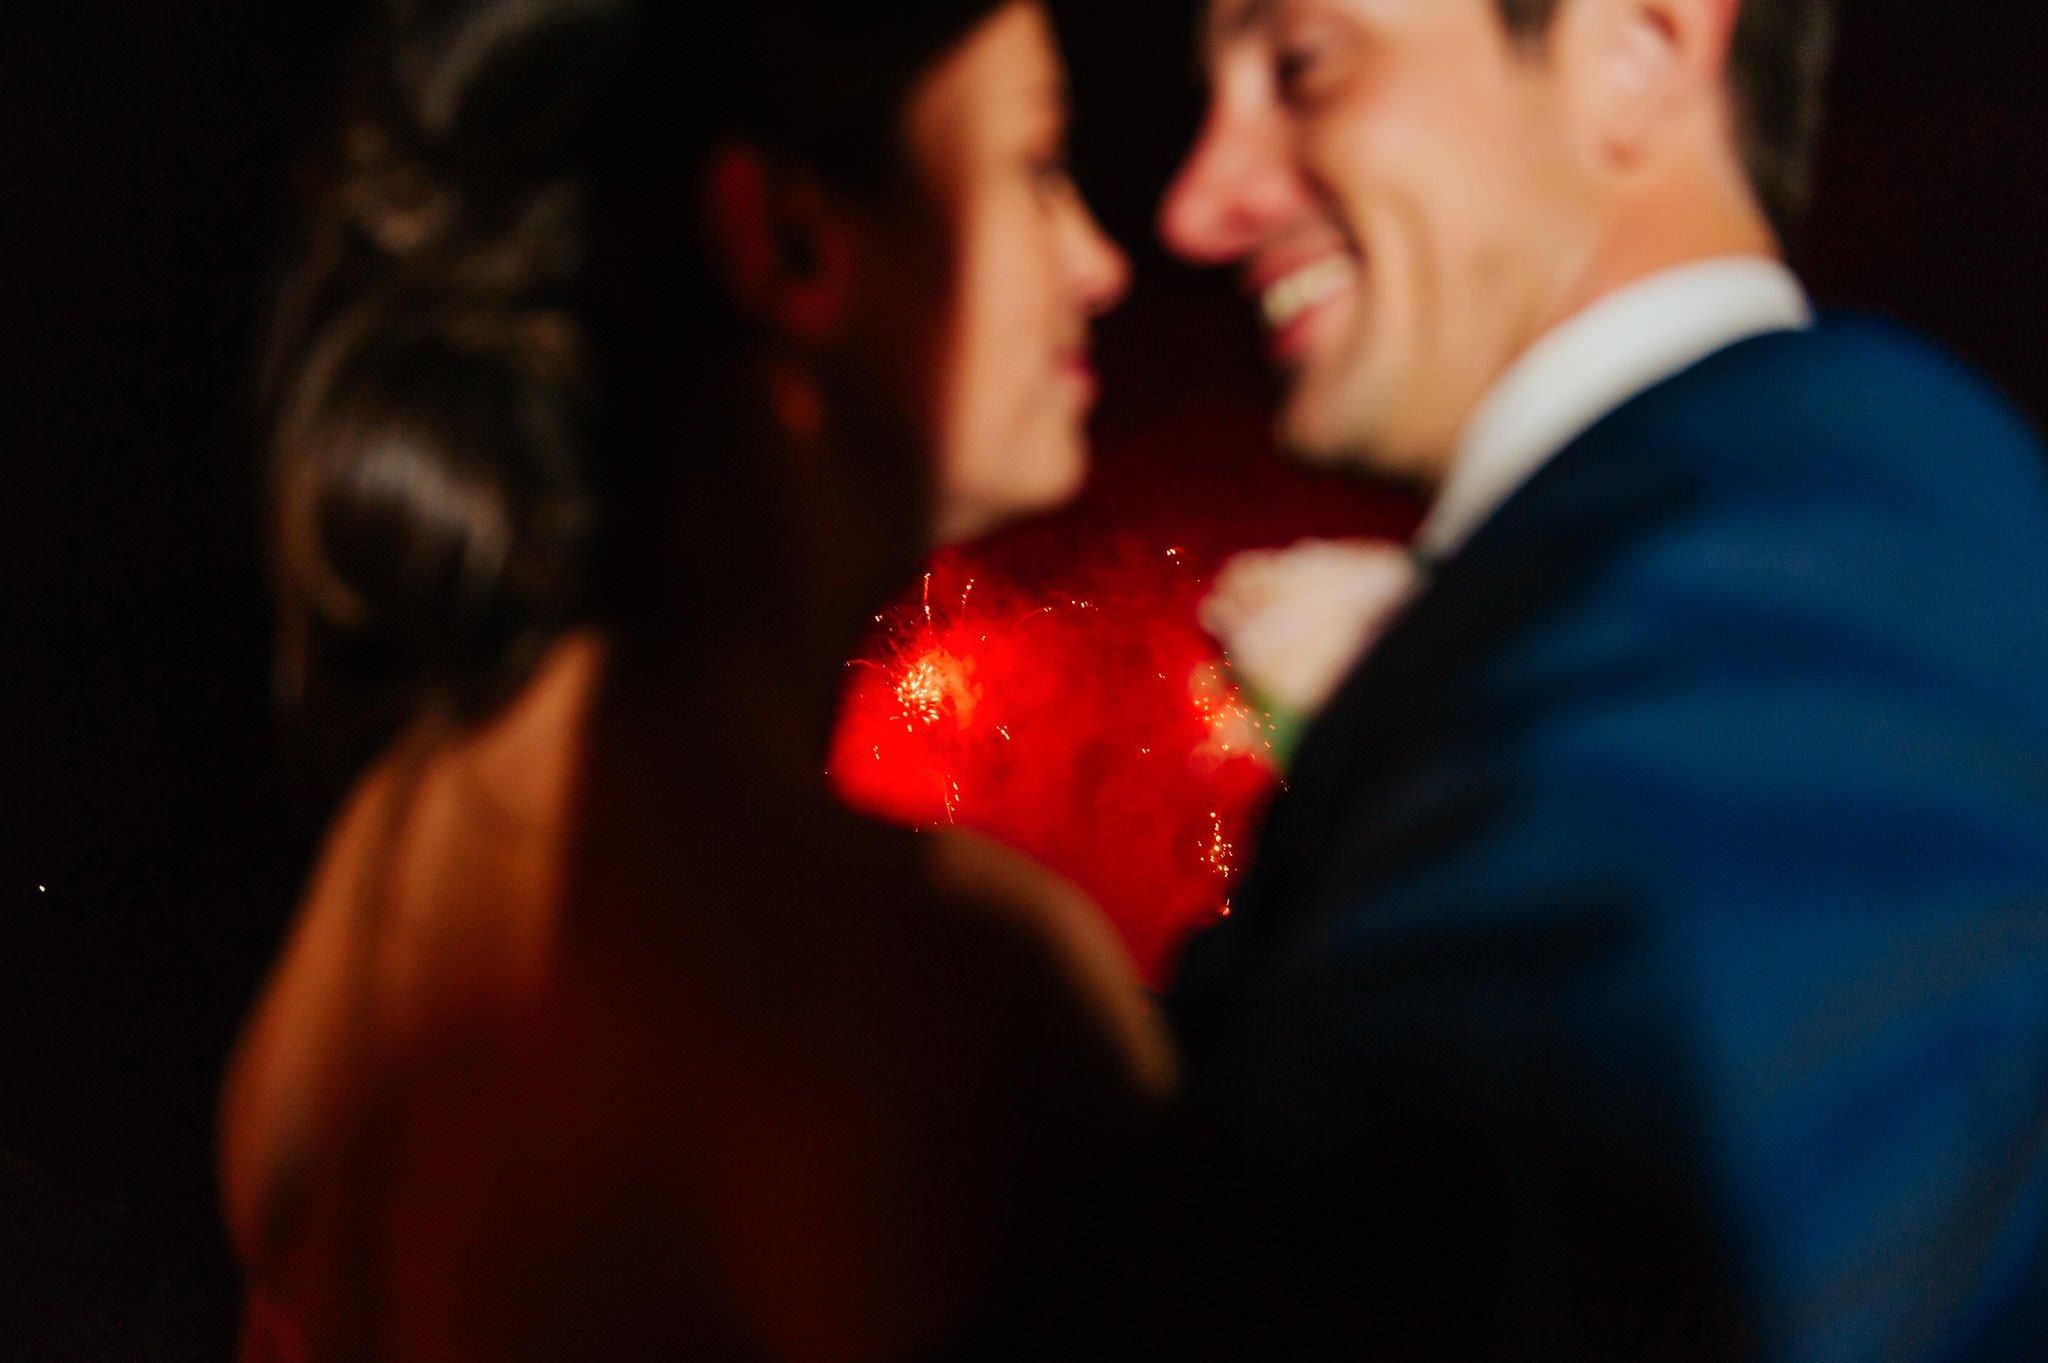 Eastnor Castle wedding photographer Herefordshire, West Midlands - Sarah + Dean 69